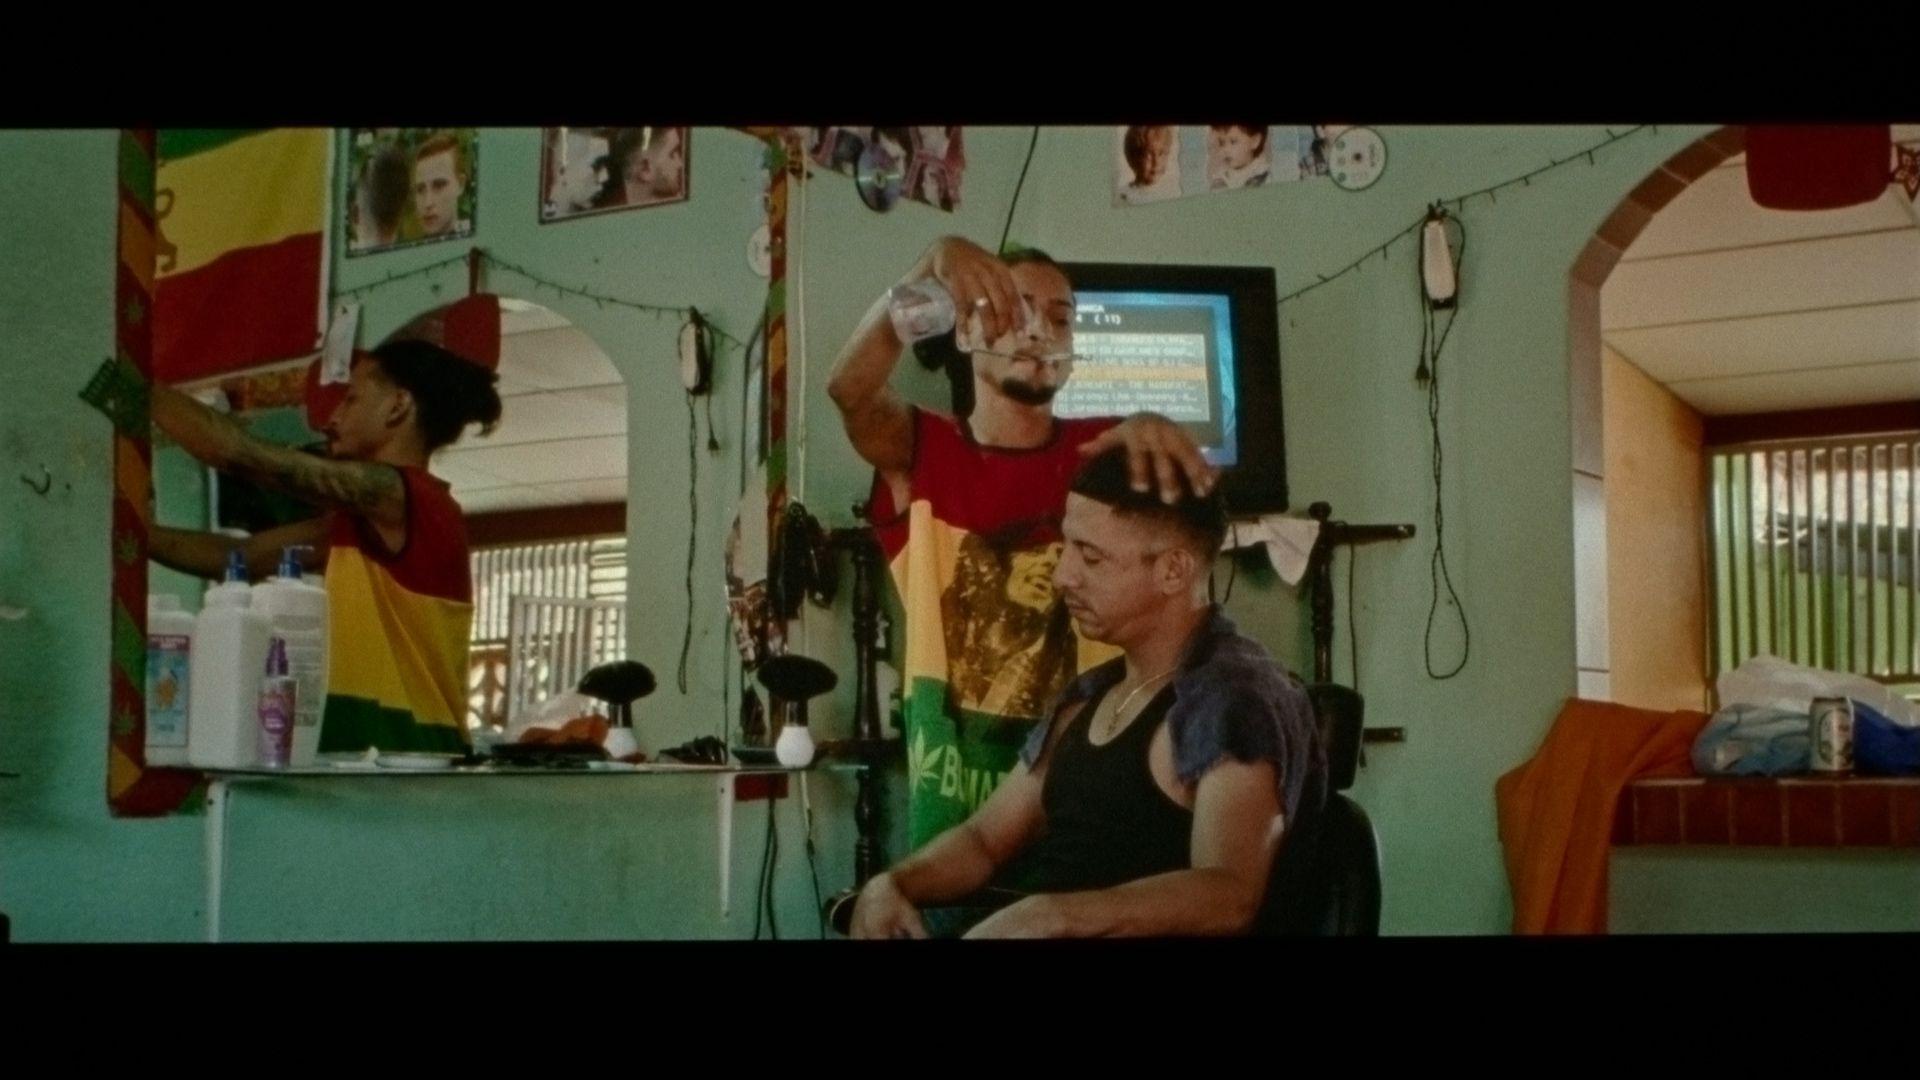 hairdresser working on man's head for singer Karim Ouellet music video of La Mer A Boire filmed by Les Gamins